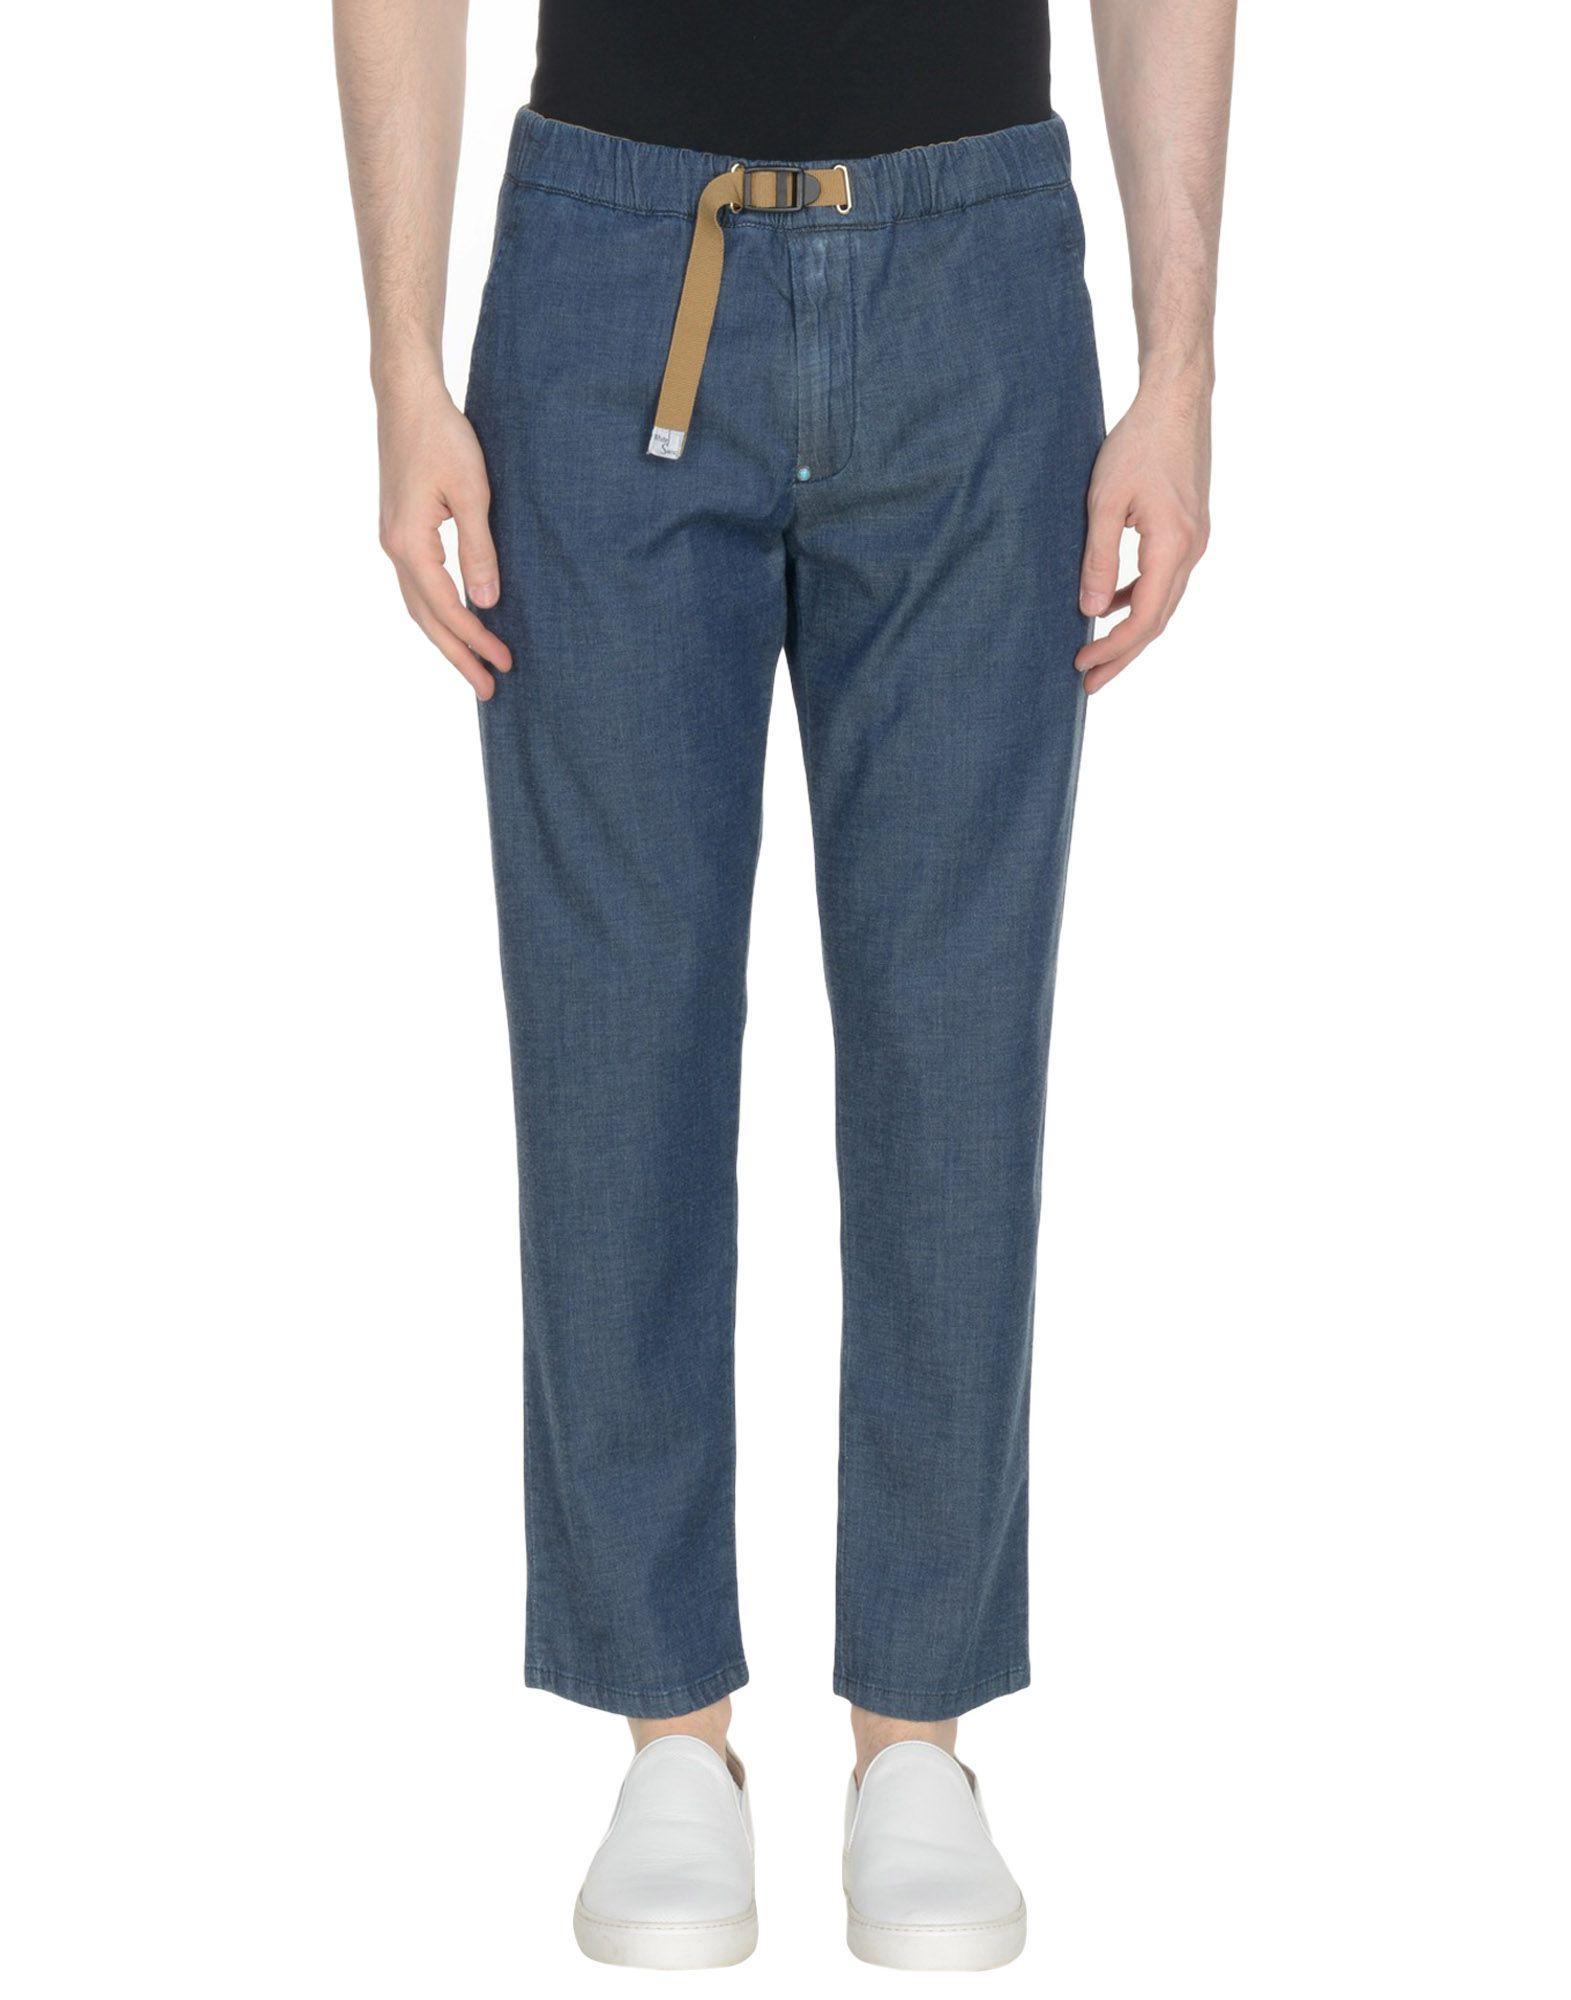 WHITE SAND 88 Джинсовые брюки